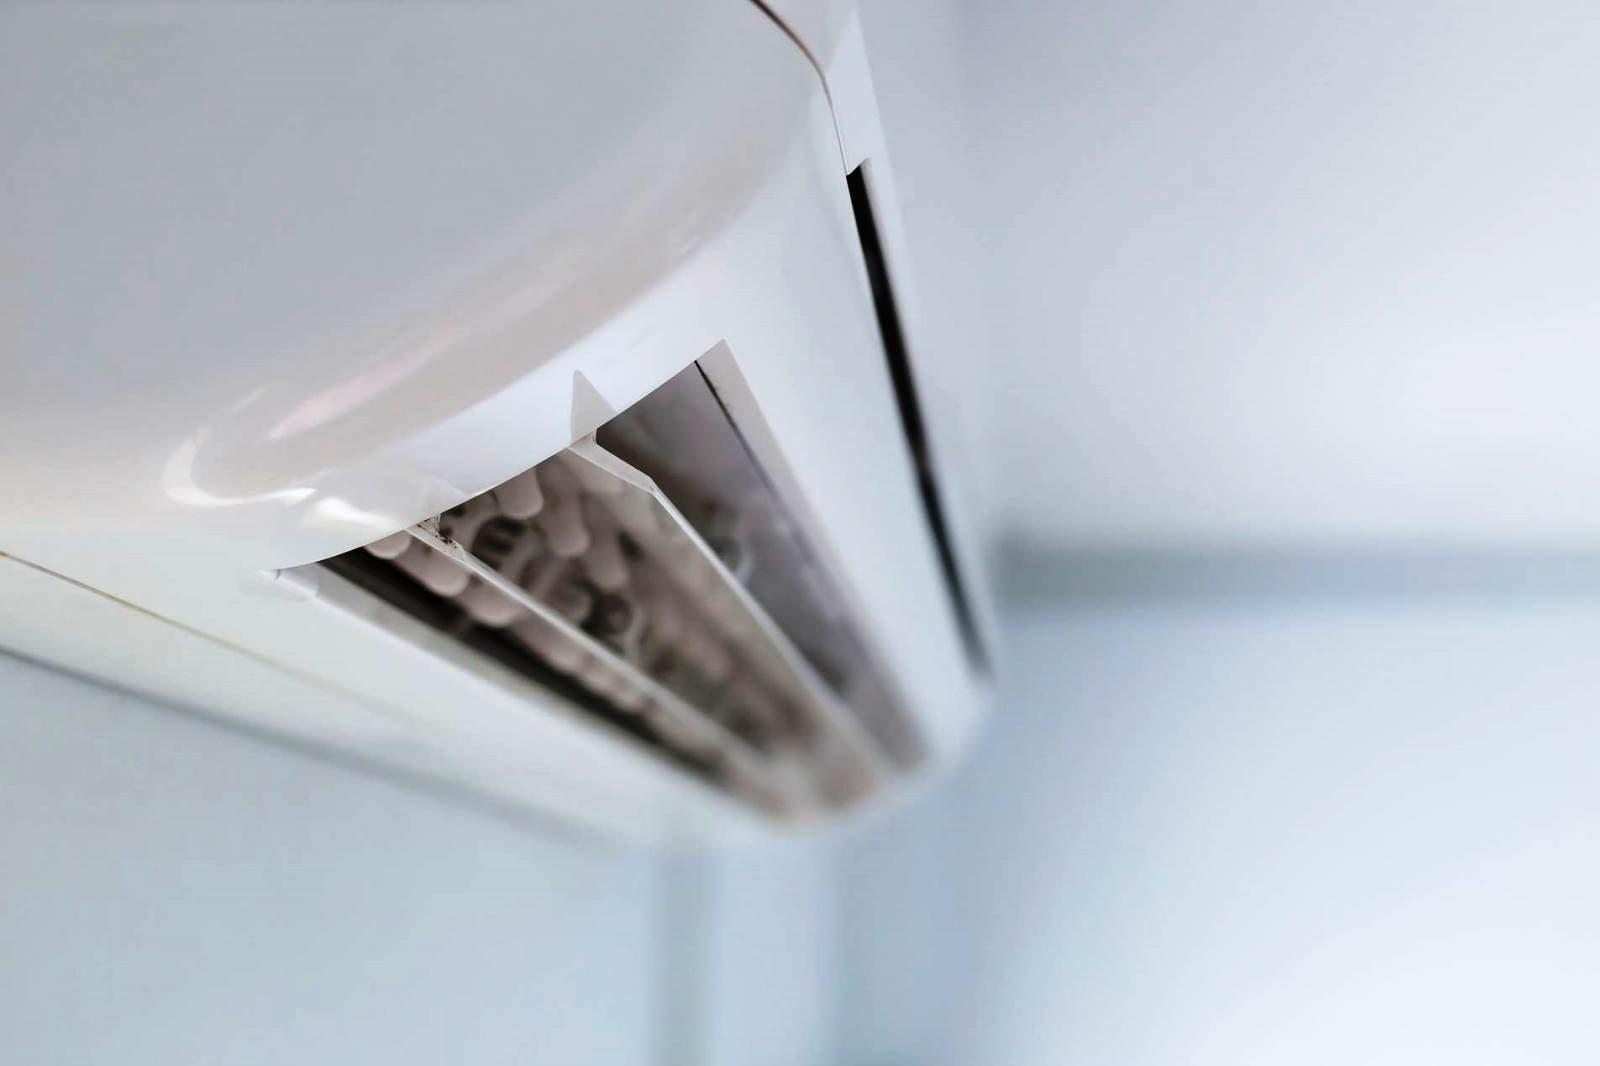 Choosing Air Conditioning Equipment